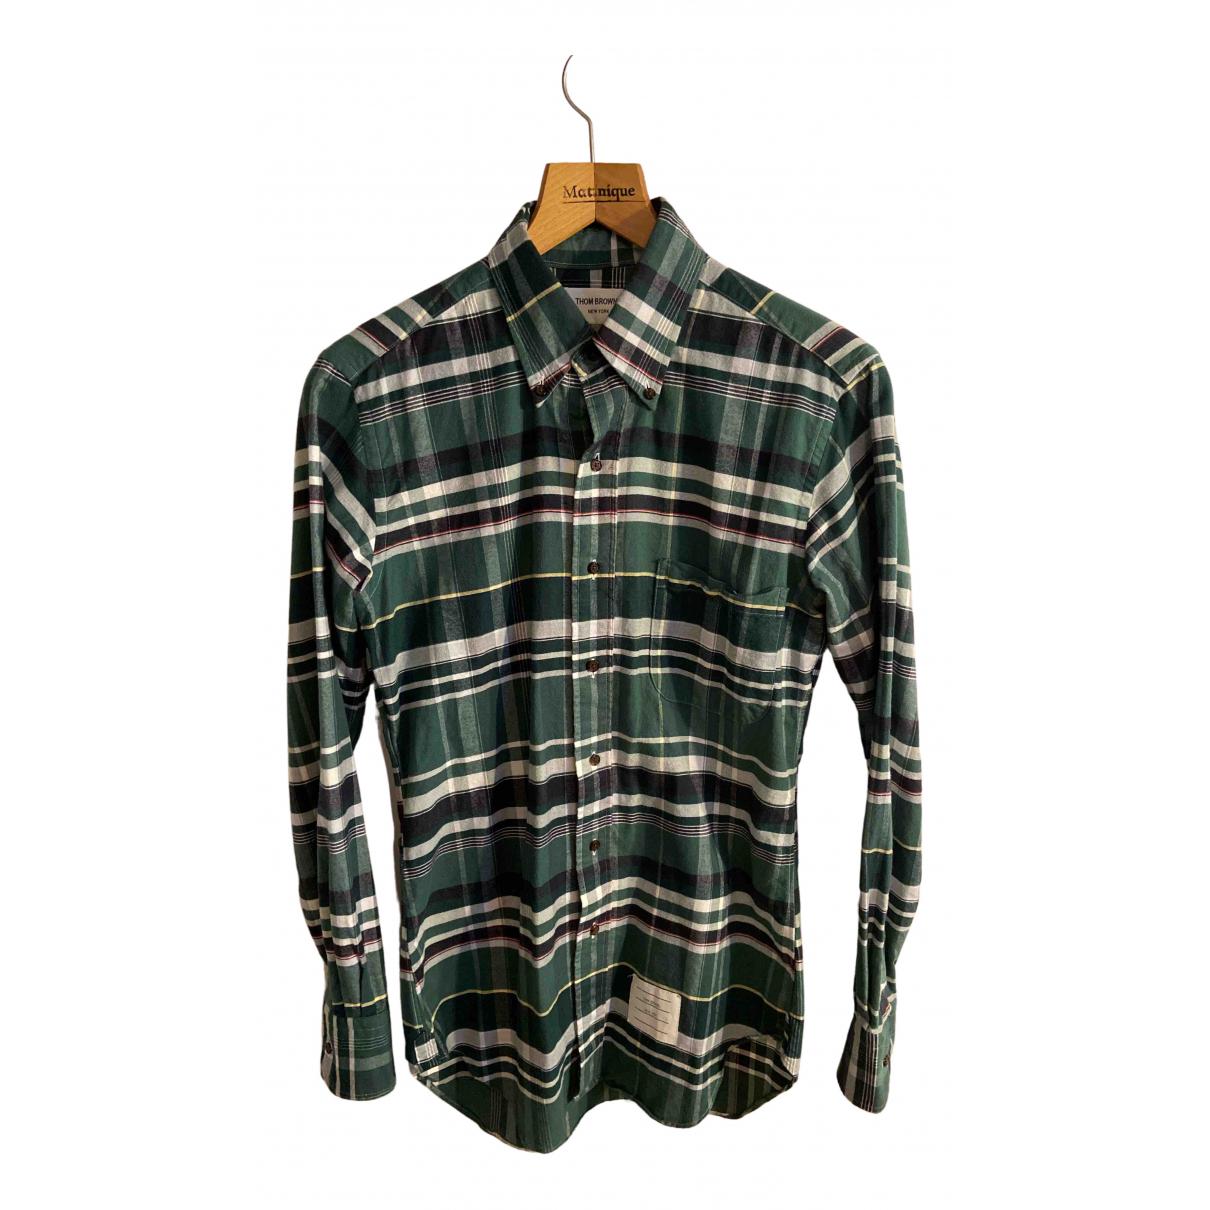 Thom Browne N Green Cotton Shirts for Men M International